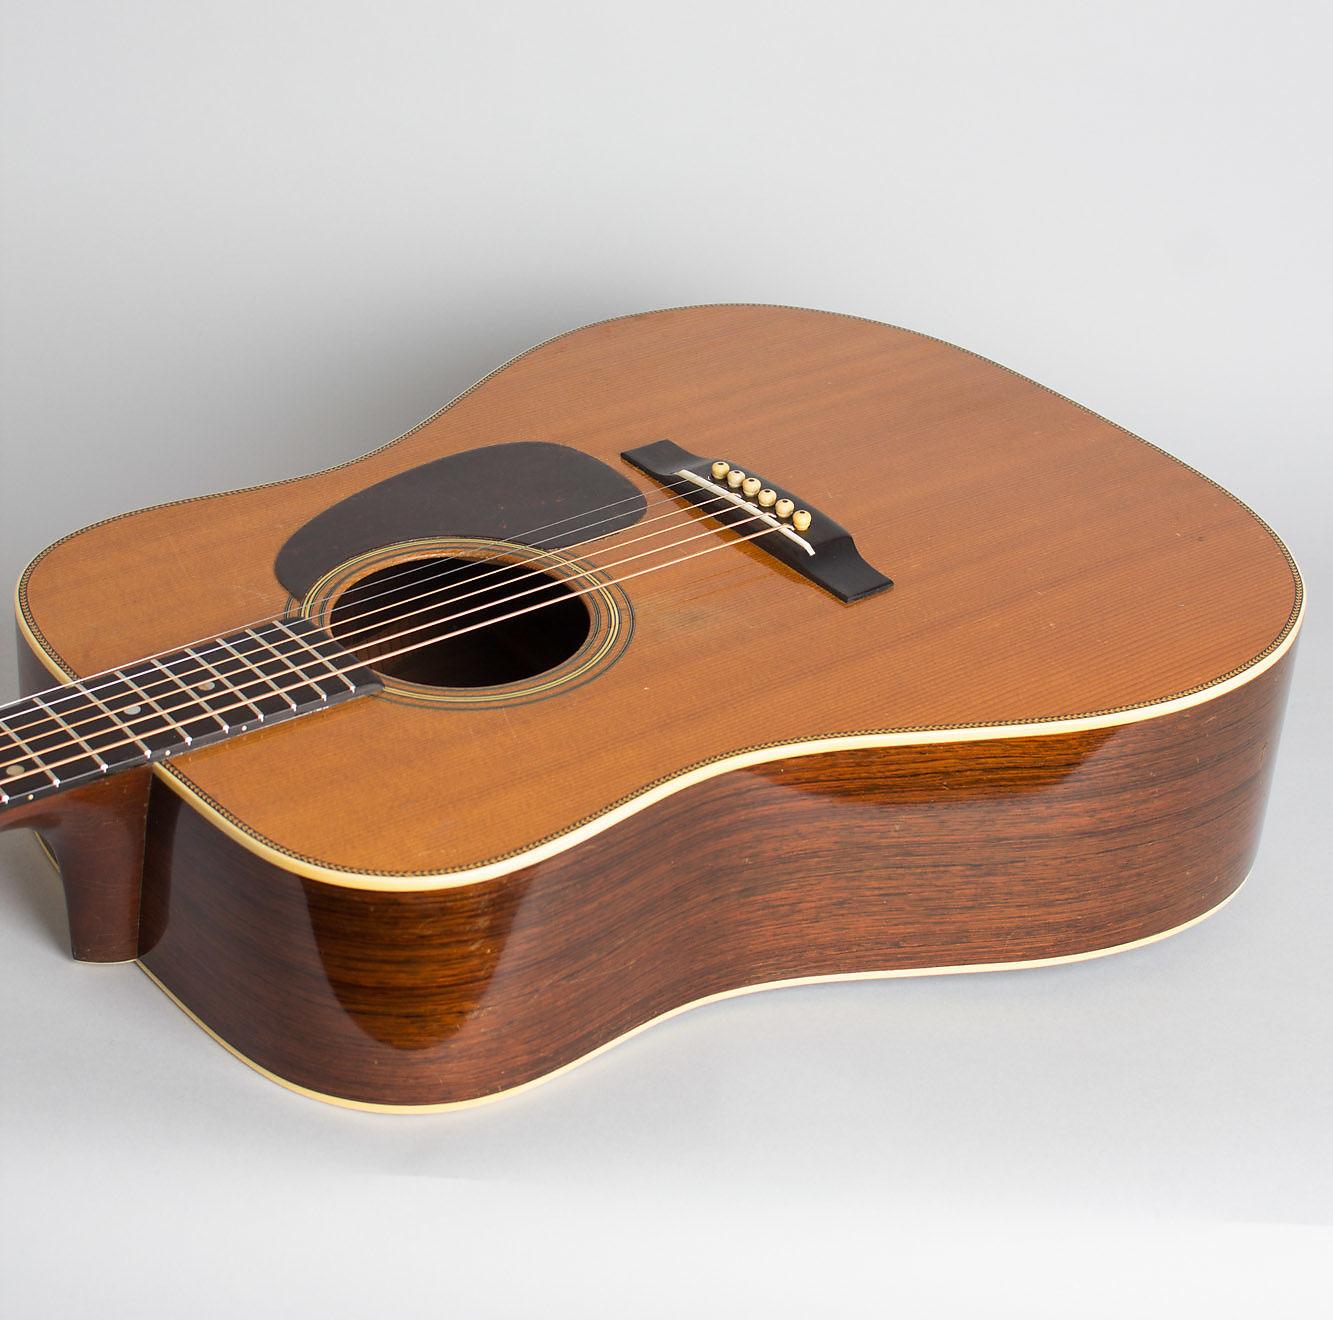 C. F. Martin  D-28 Herringbone Flat Top Acoustic Guitar (1946), ser. #96265, brown hard shell case.